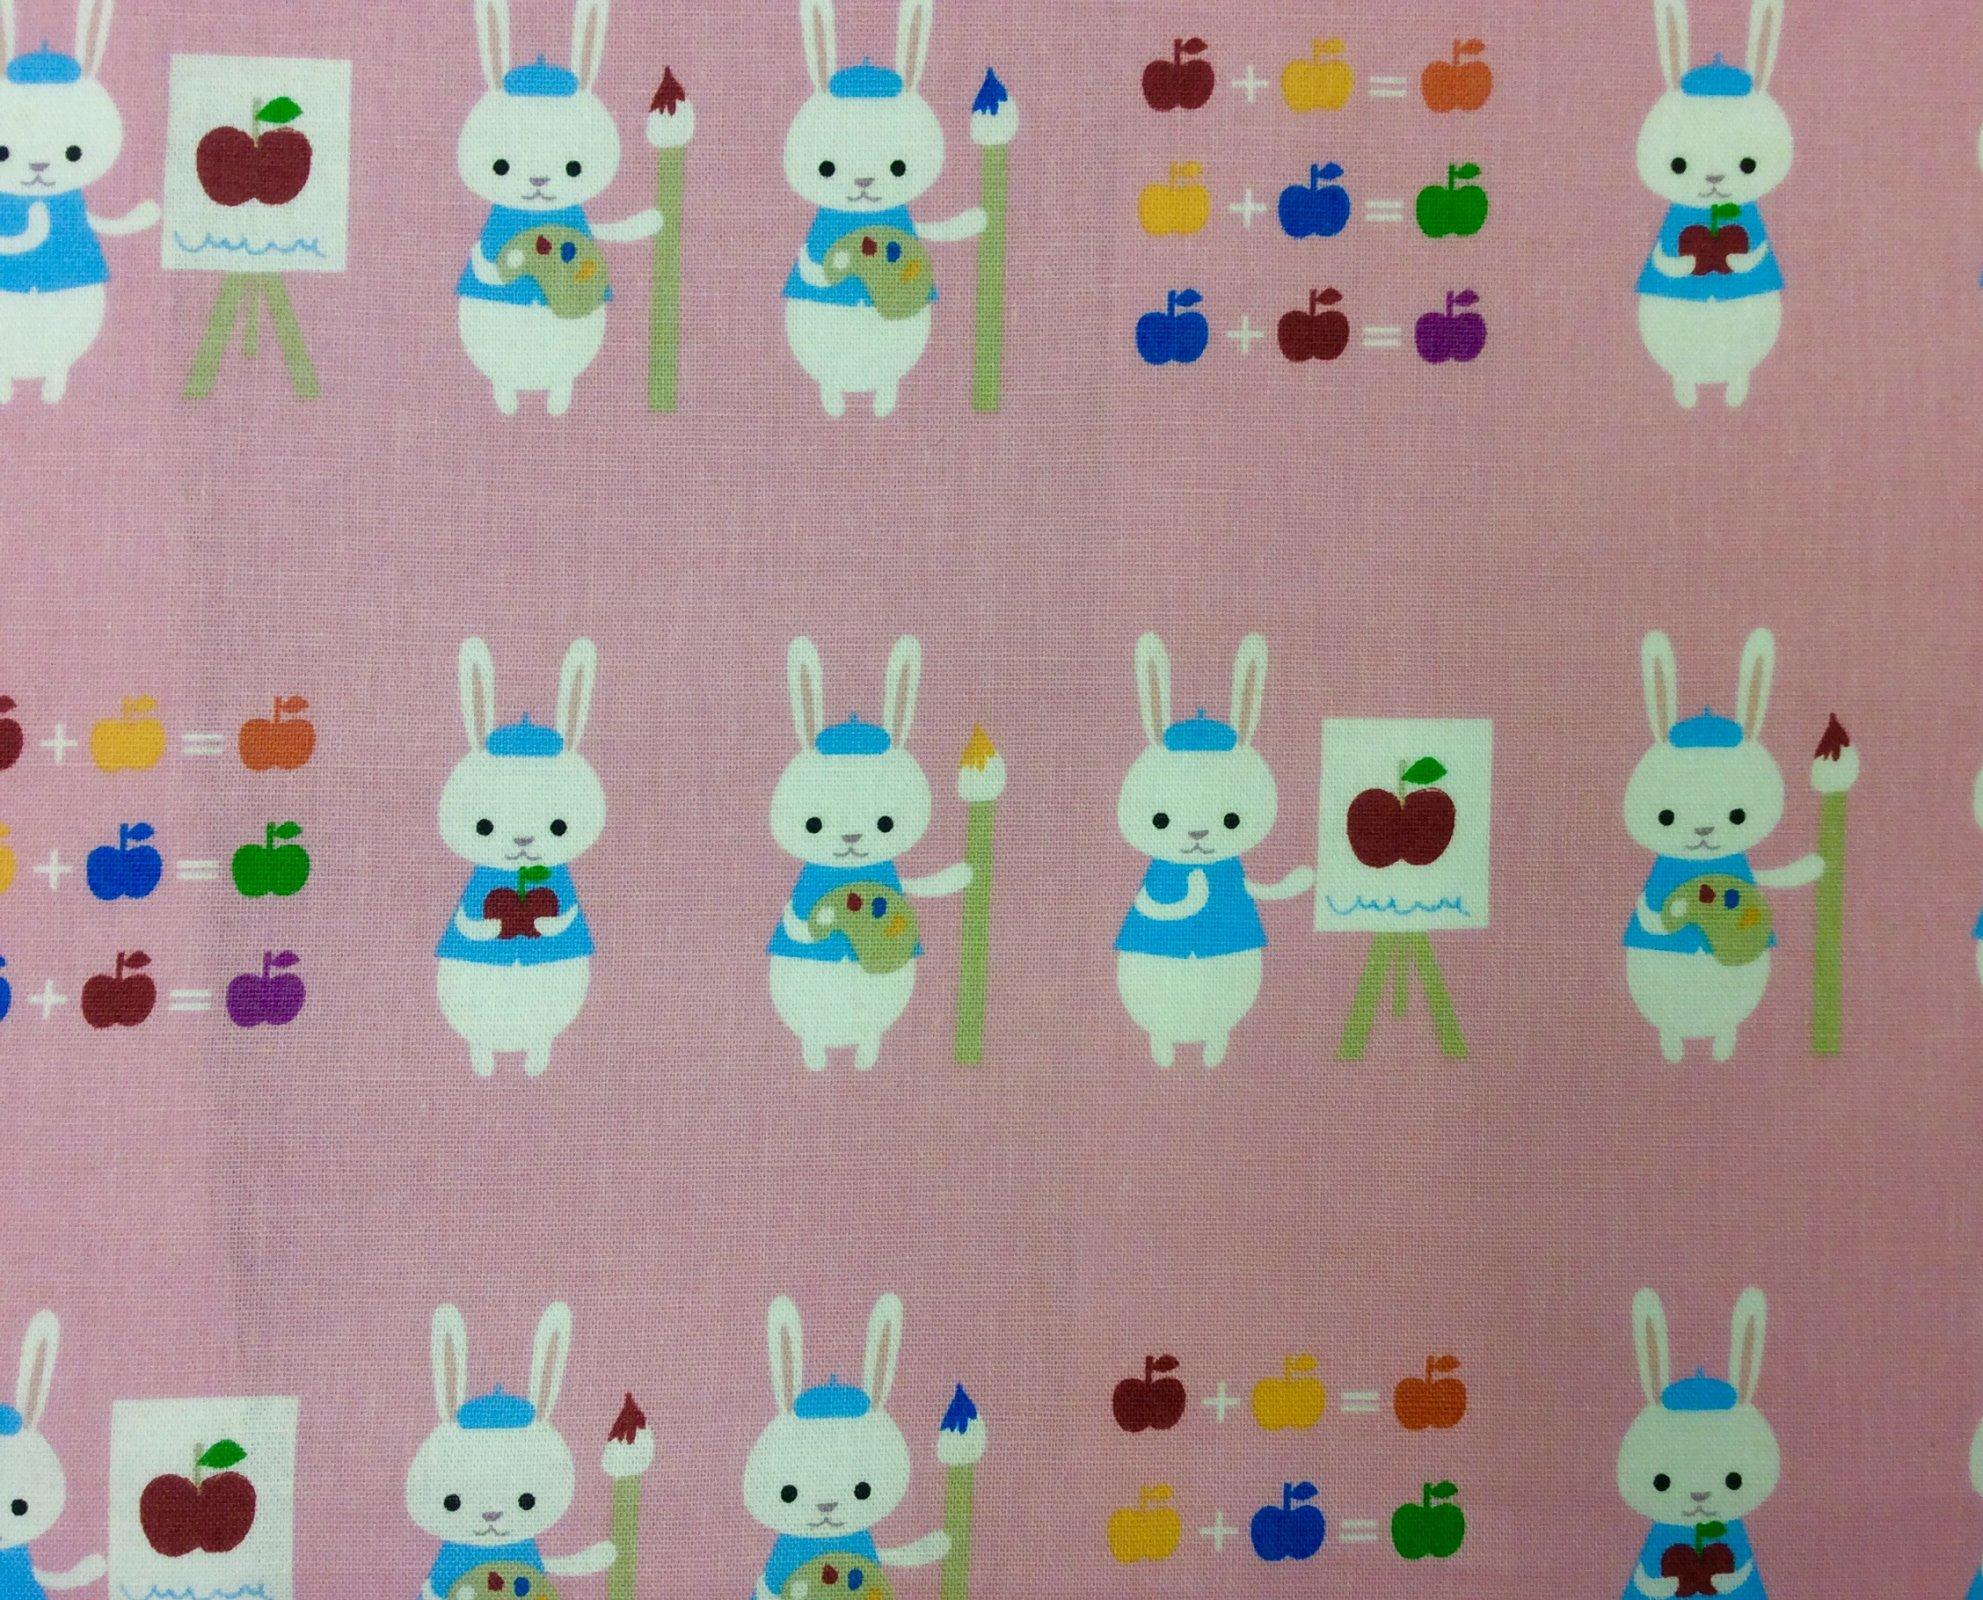 SVI02 Made in Japan Lightweight Canvas Fabric Cute Bunny Putidepome Pink Rabbit Artist Apple Fabric